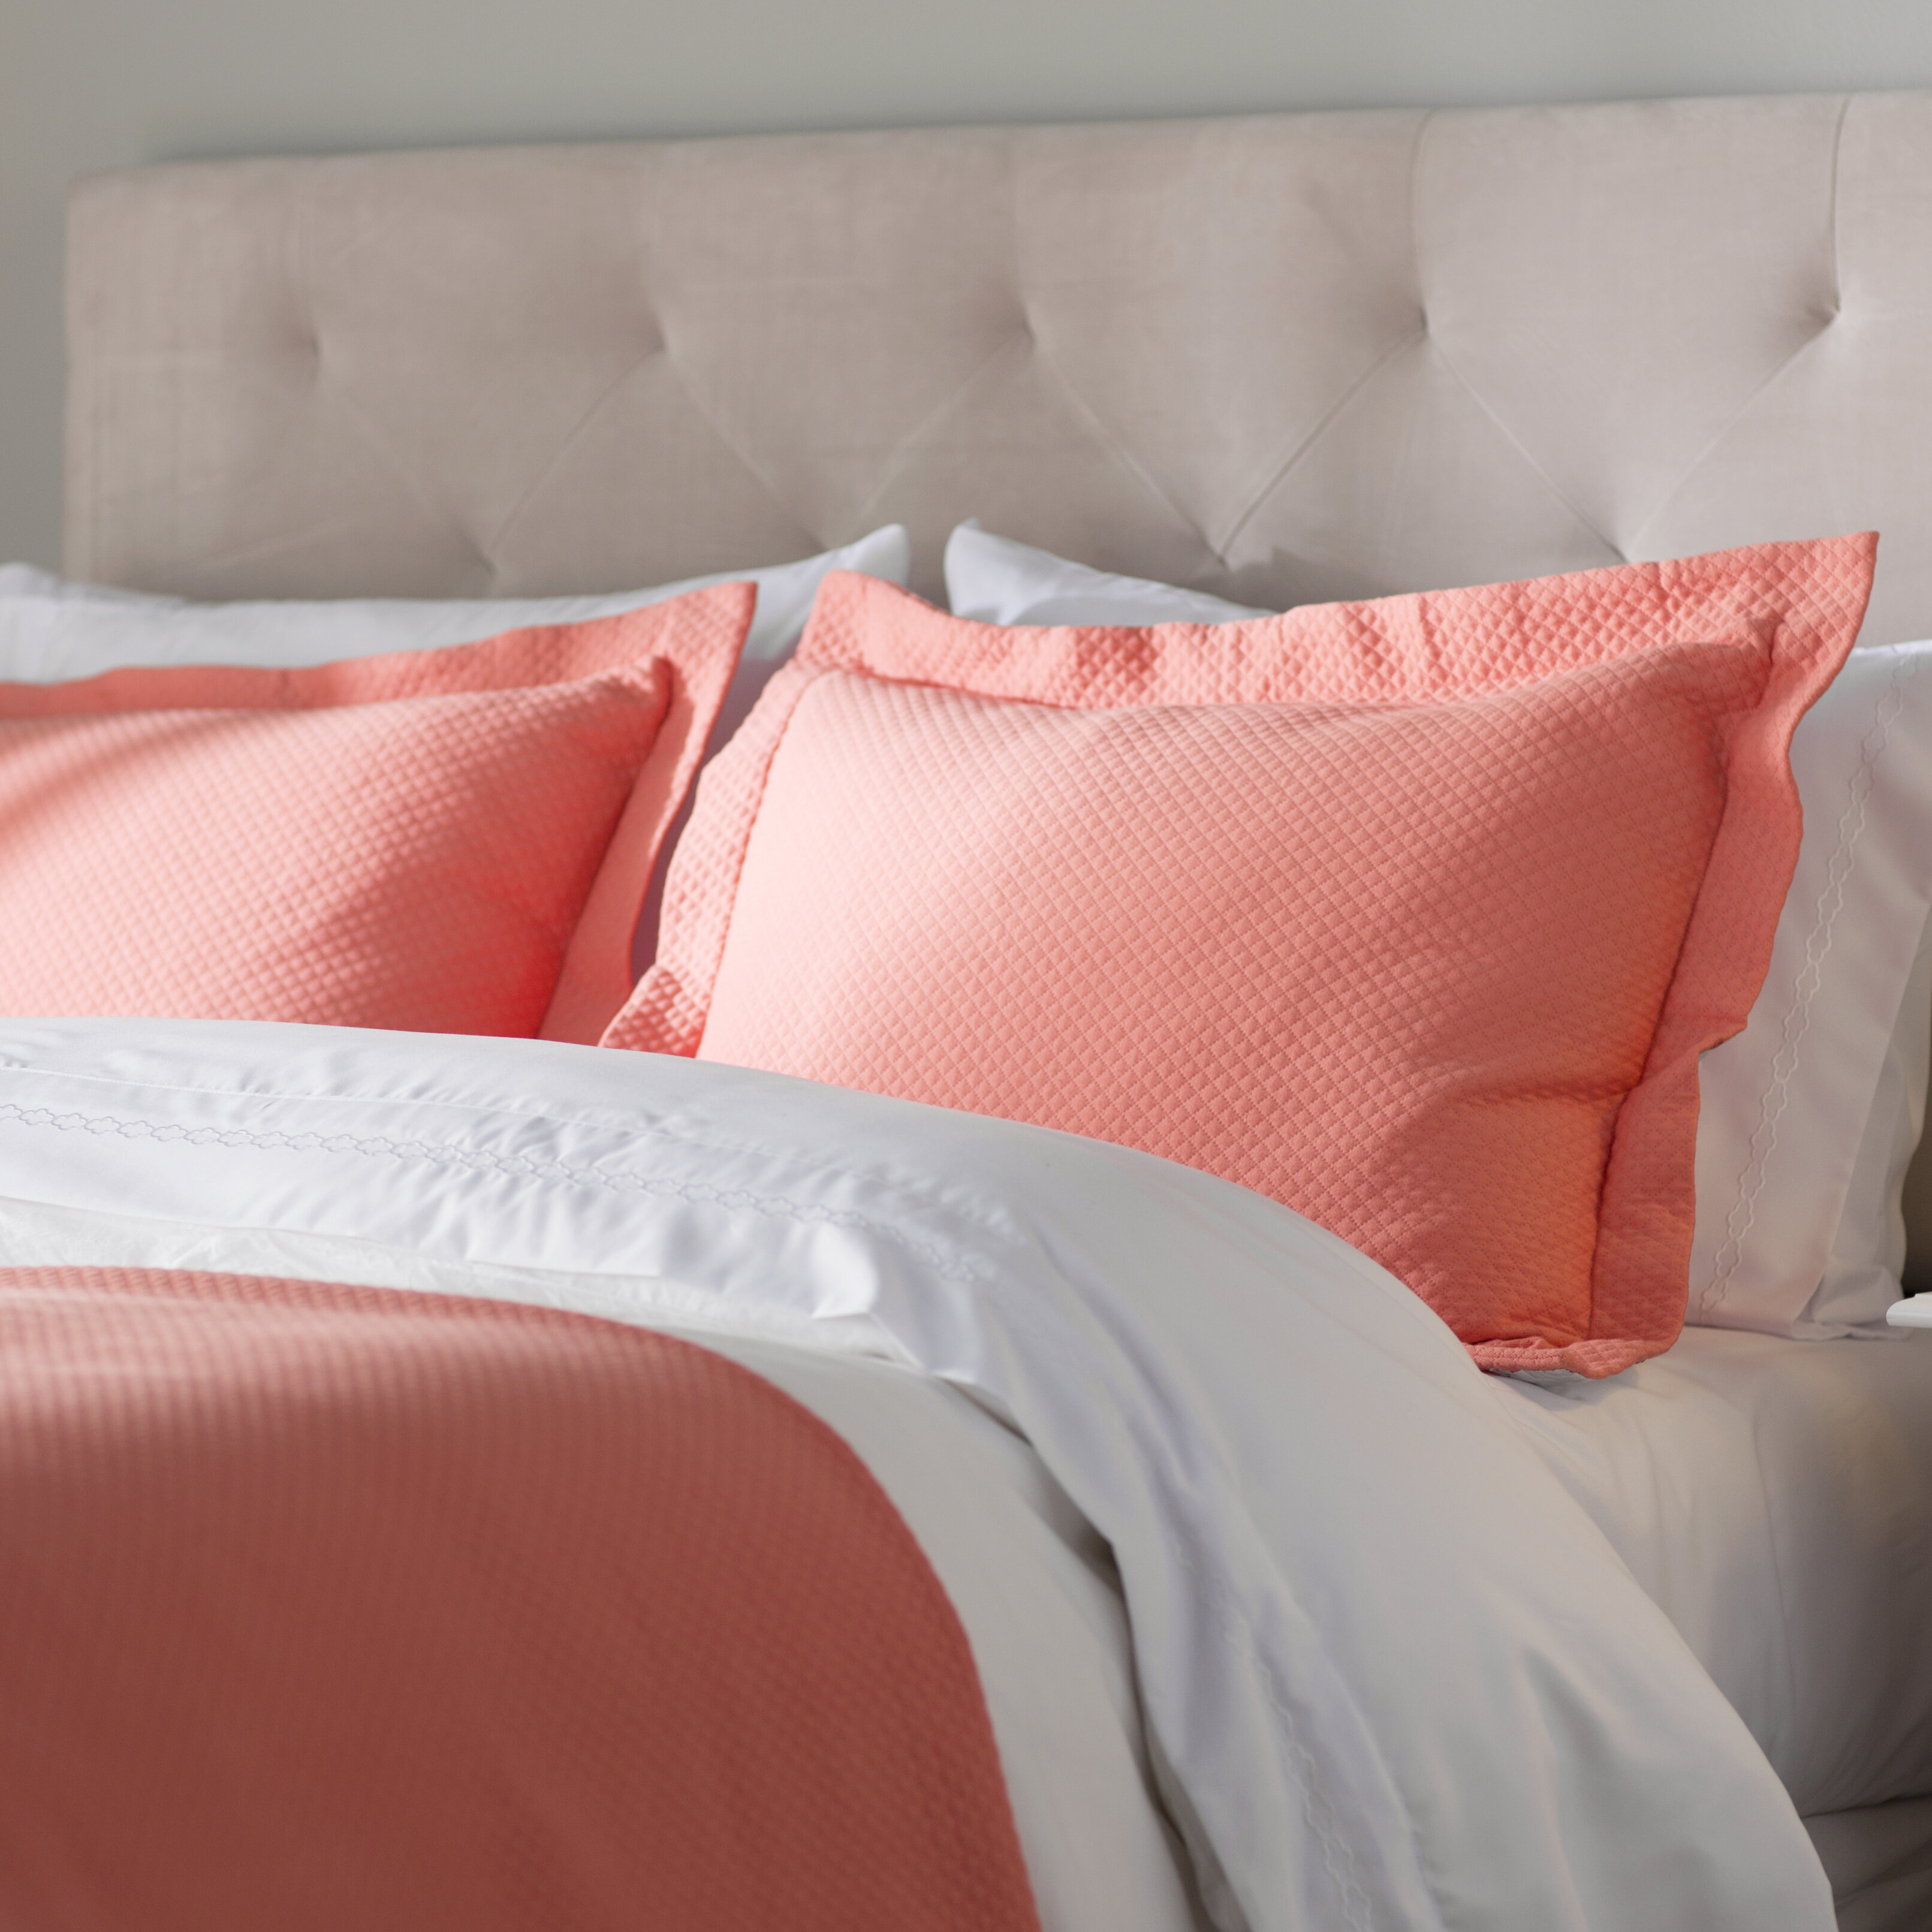 100/% COTTON HAMPTON BASKET WEAVE PATTERN HOTEL MATELASSE WHITE EURO SHAM